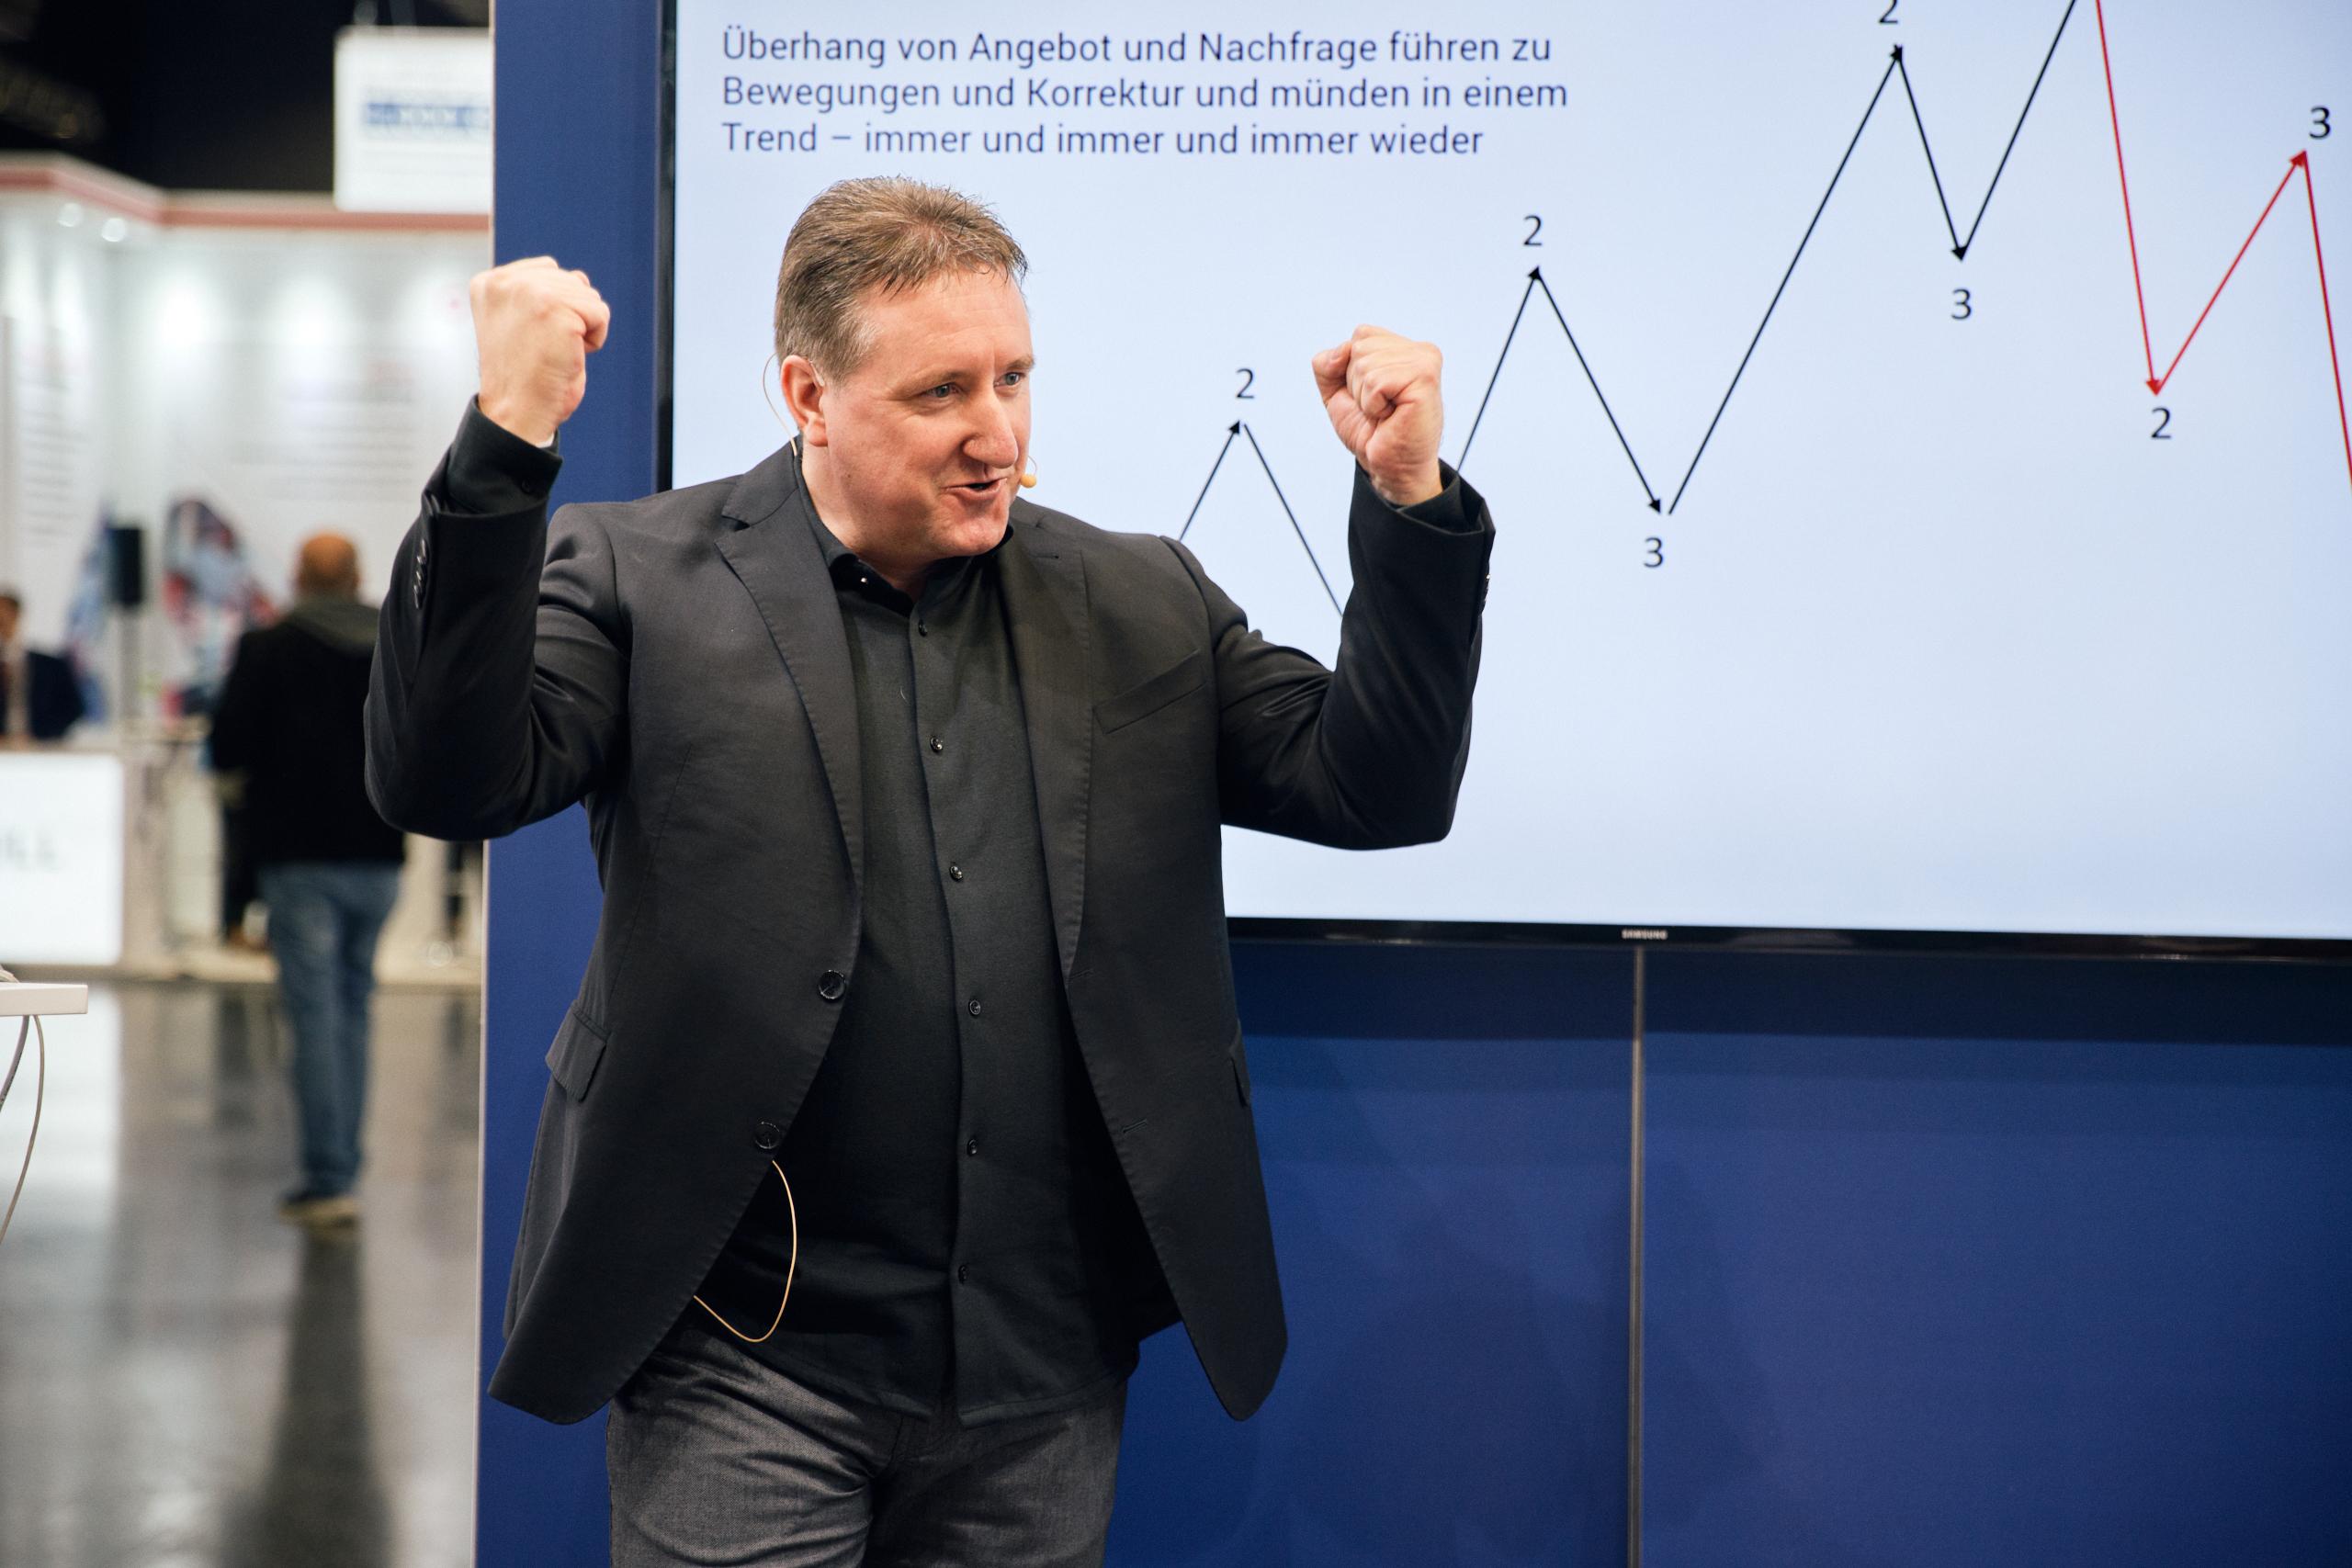 World-of-Trading-2019-Messe-Bericht-vom-Centre-Court-Kommentar-Jens-Chrzanowski-GodmodeTrader.de-3